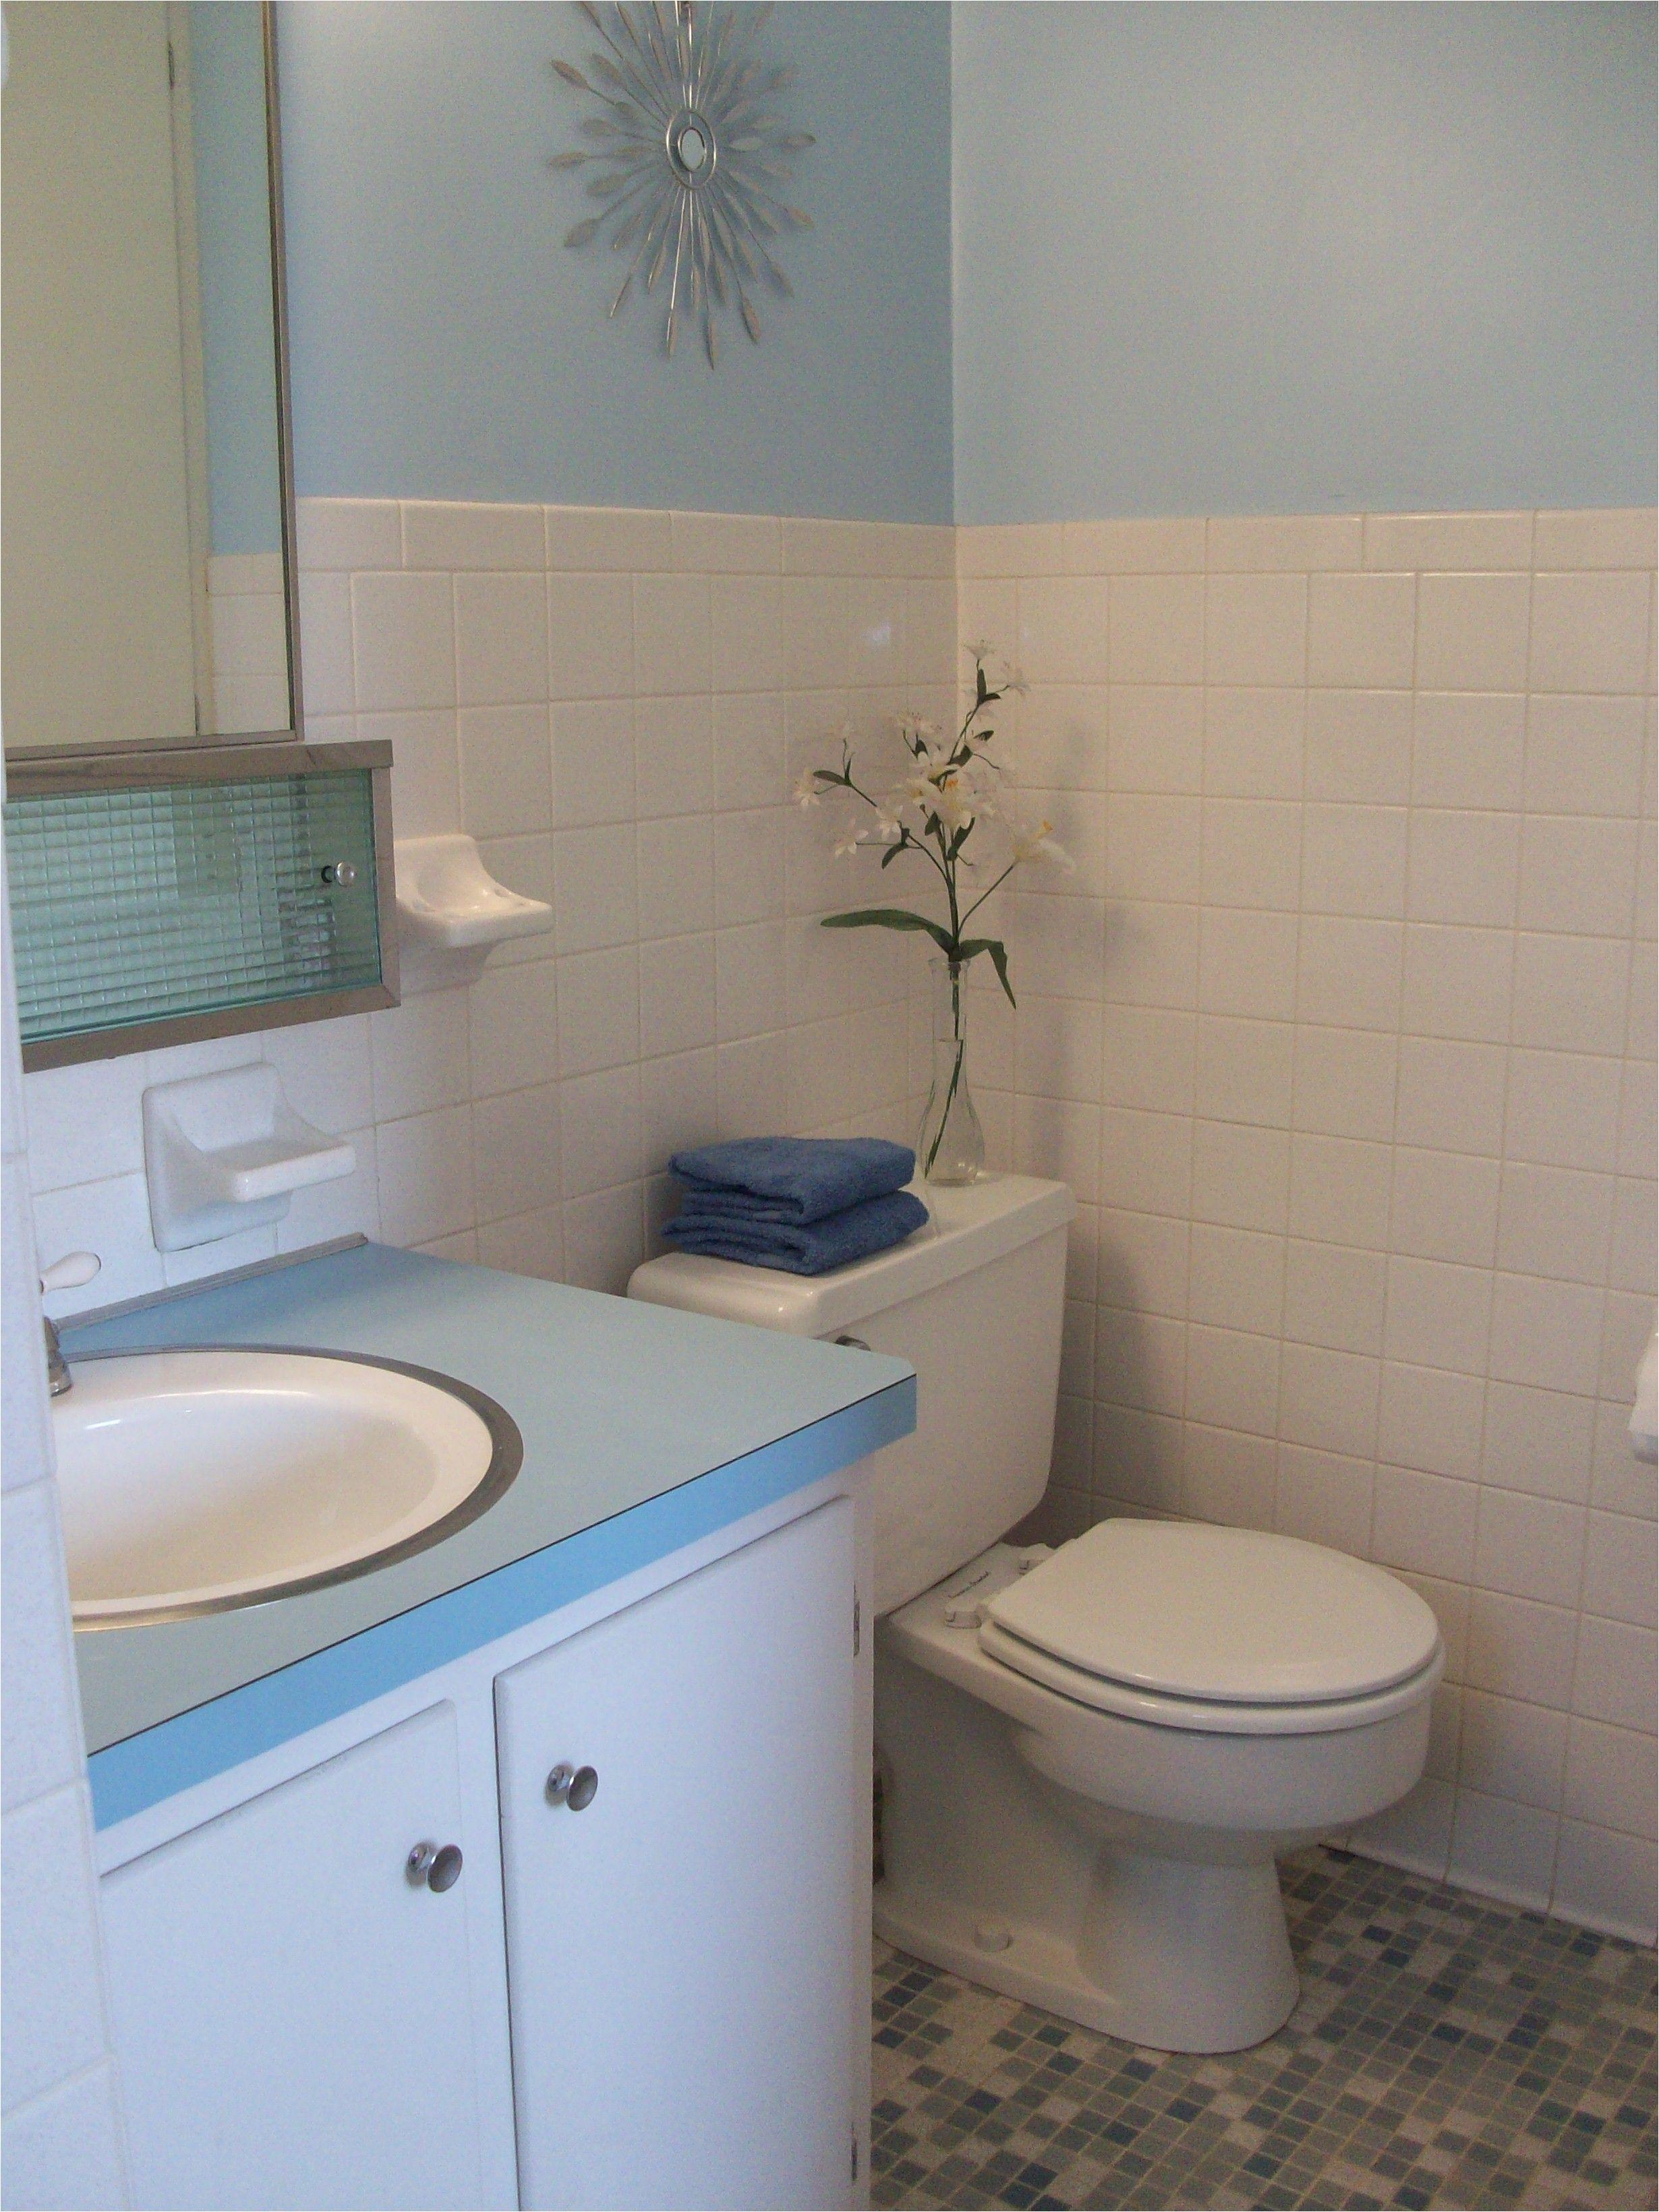 5×7 Bathroom Remodel Pictures Blue and White Retro Bathroom Vintage Bathroom In 2018